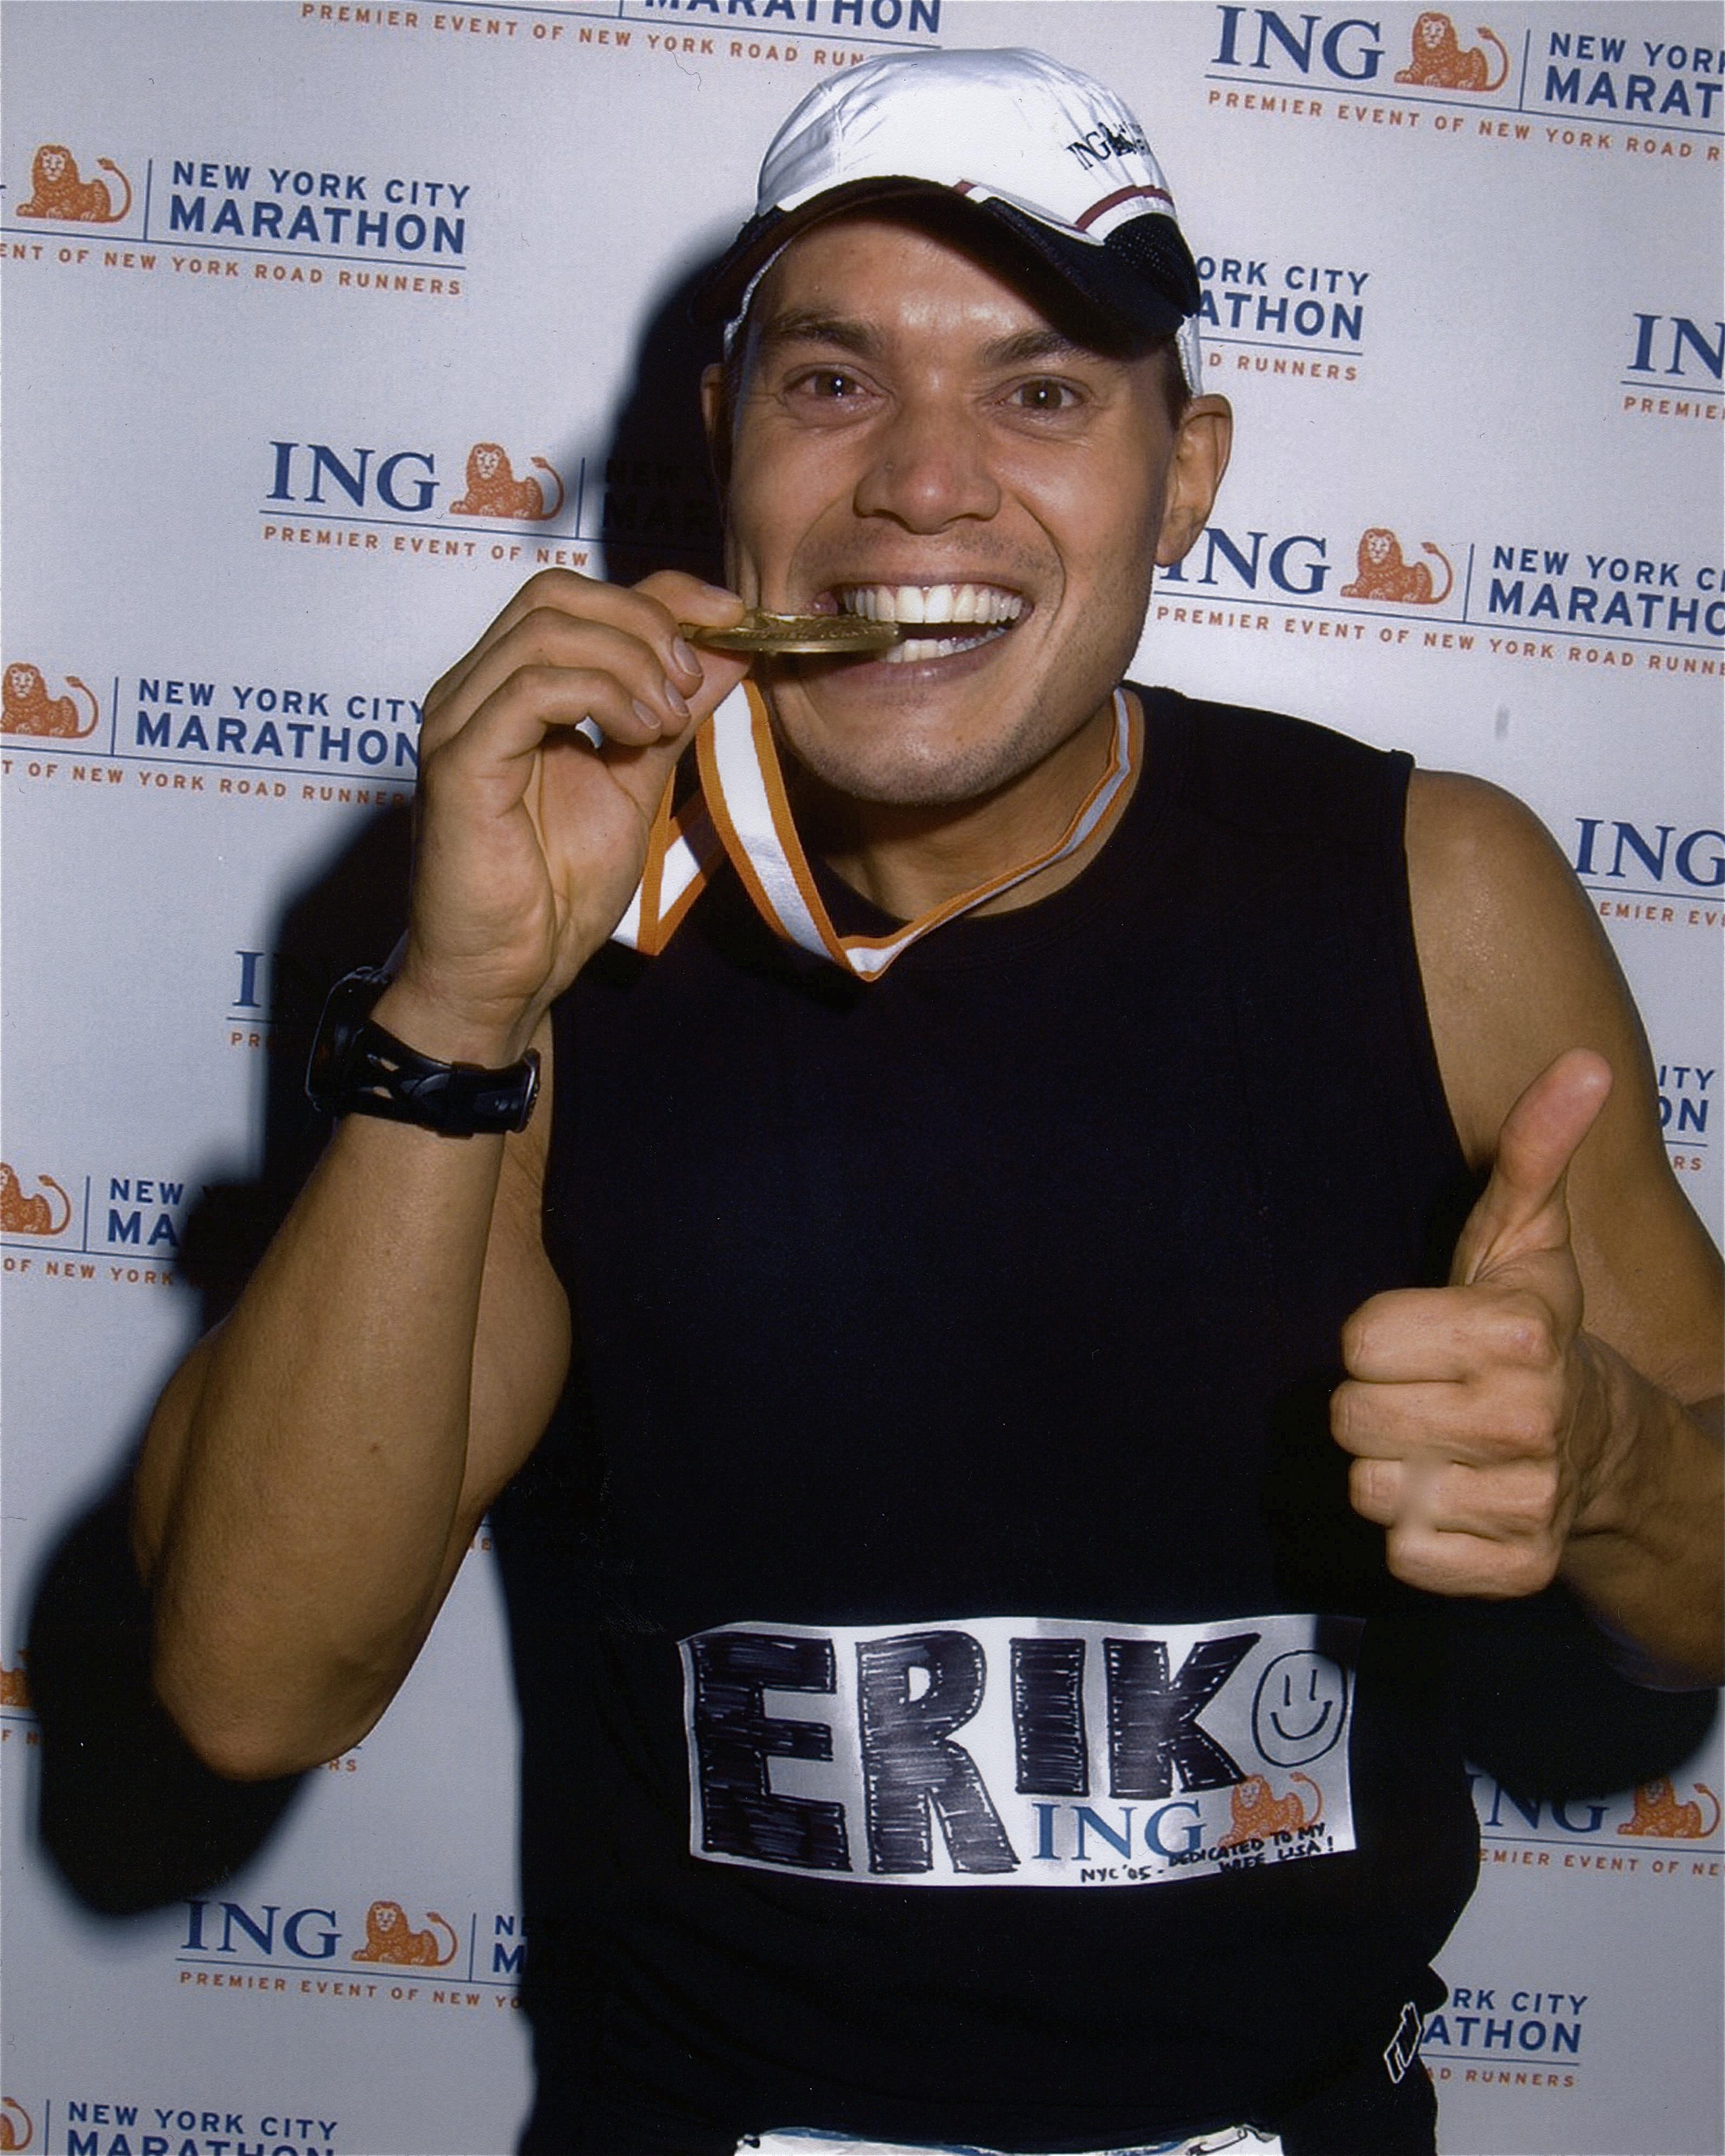 N.Y.C. Marathon.